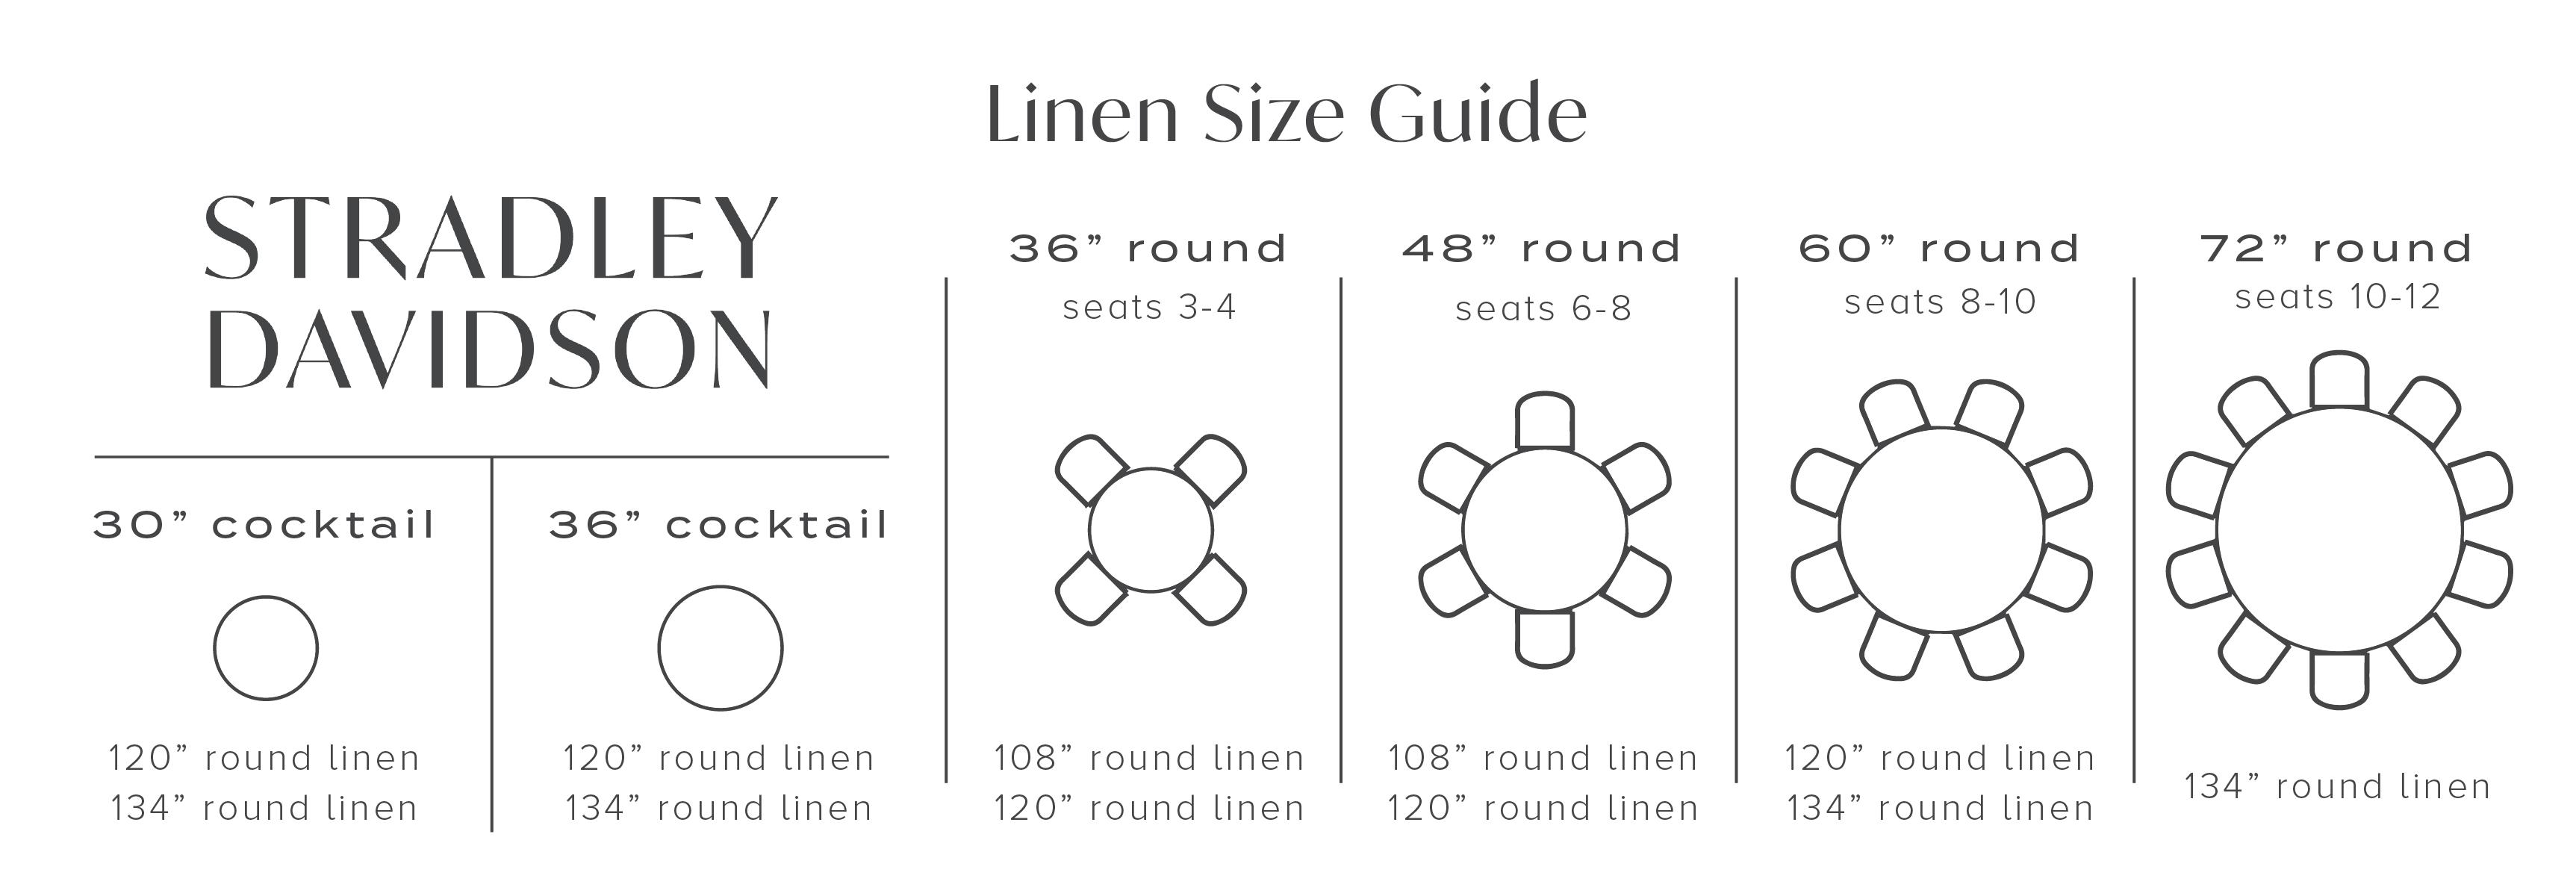 Linen Size Guide